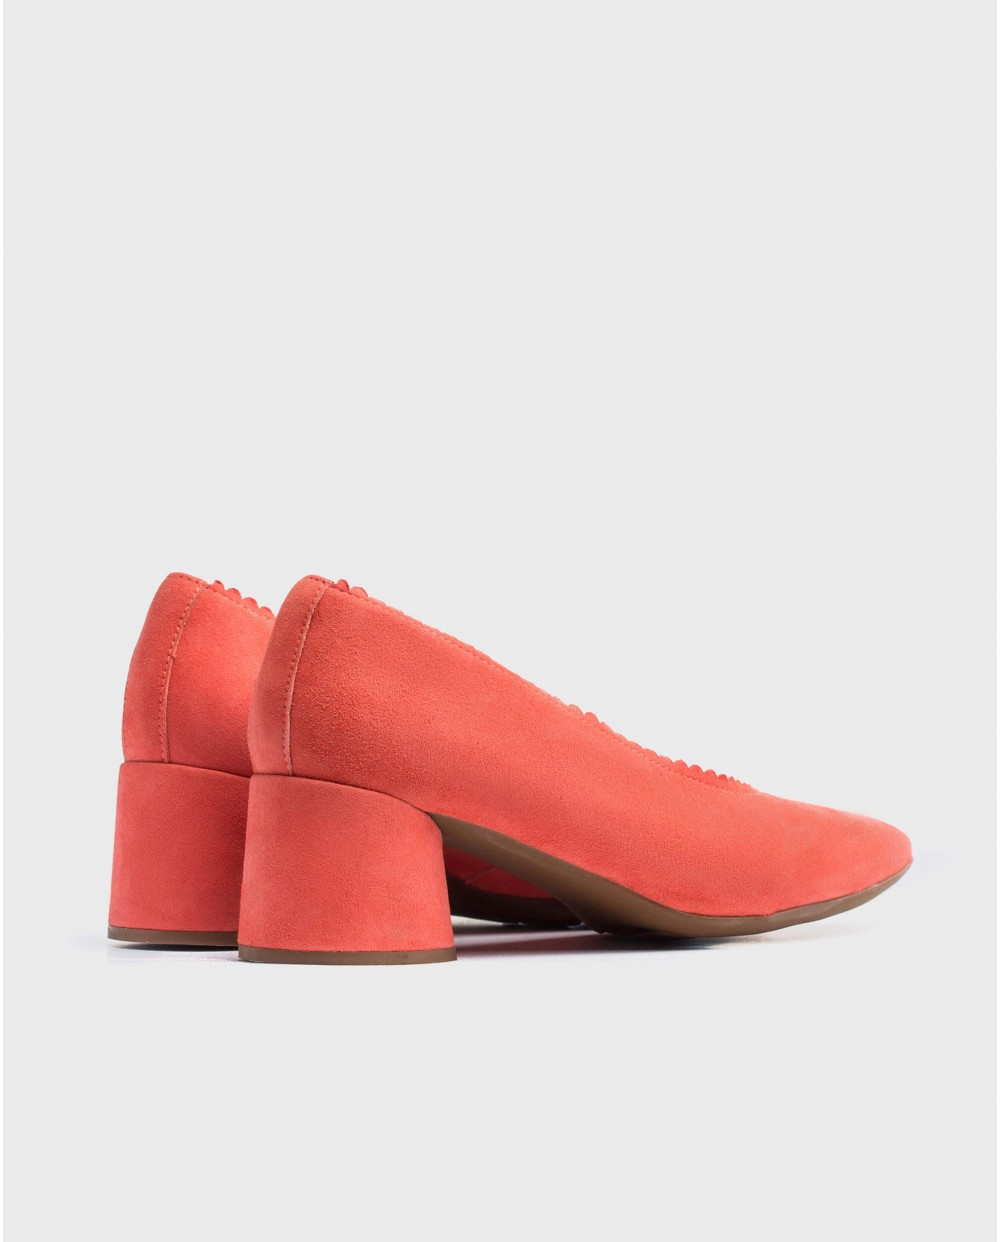 Wonders-Heels-Midi/heeled court shoe